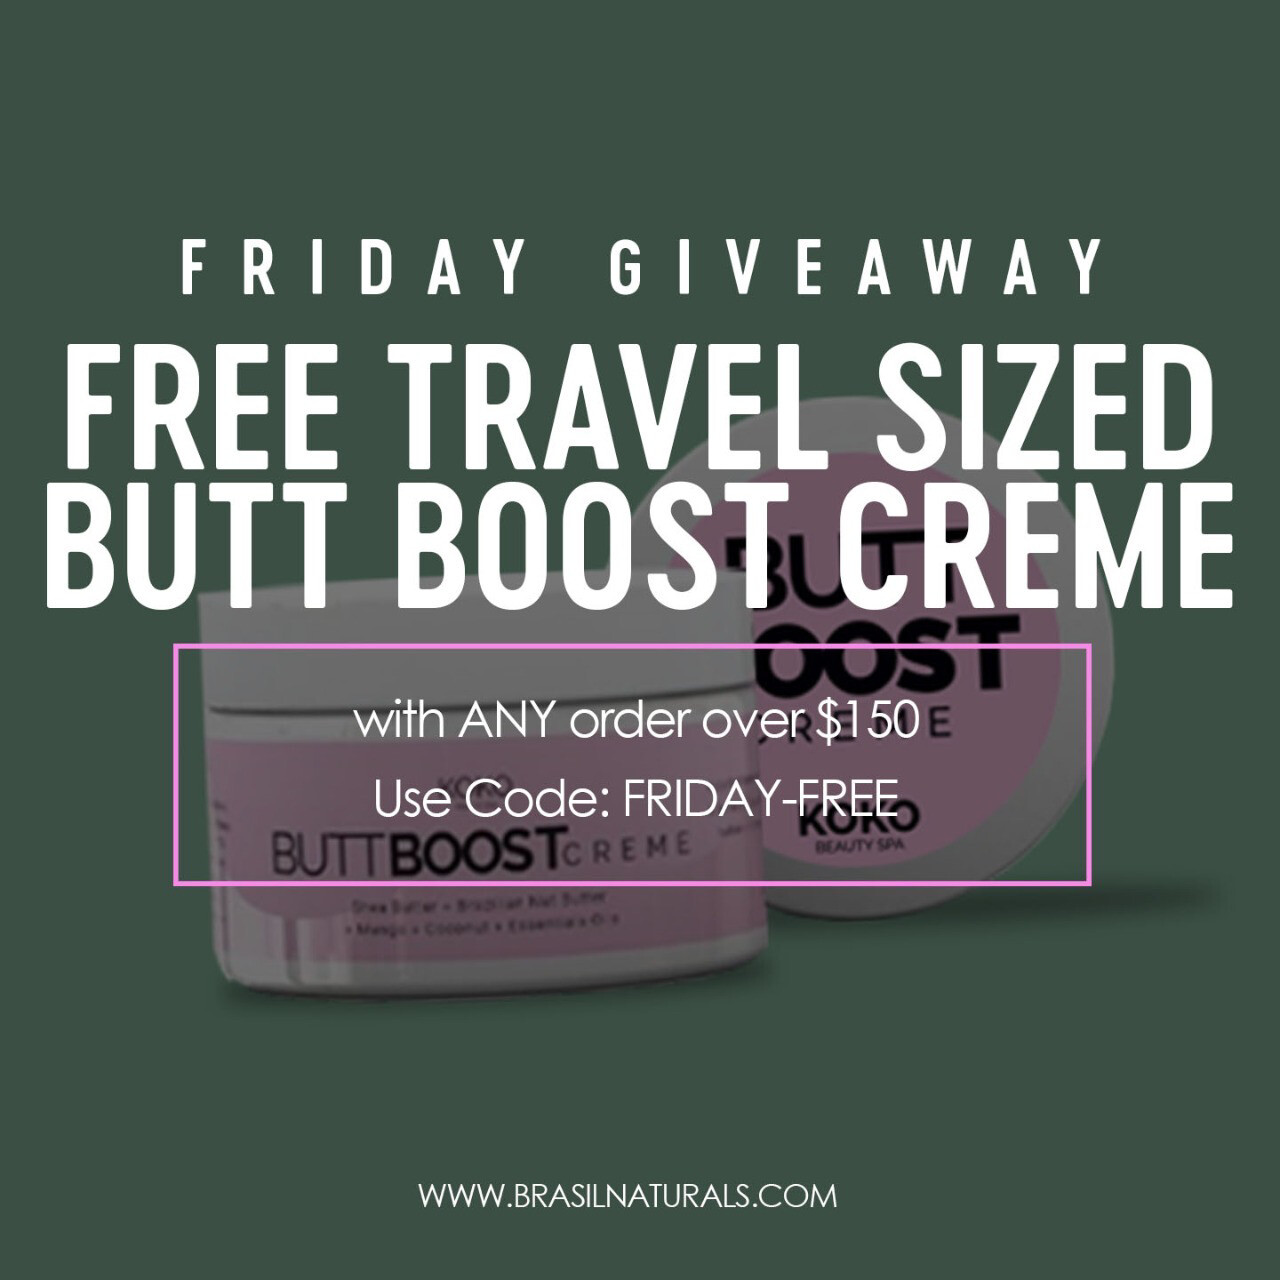 Butt Boost Creme // 2 Week Trial